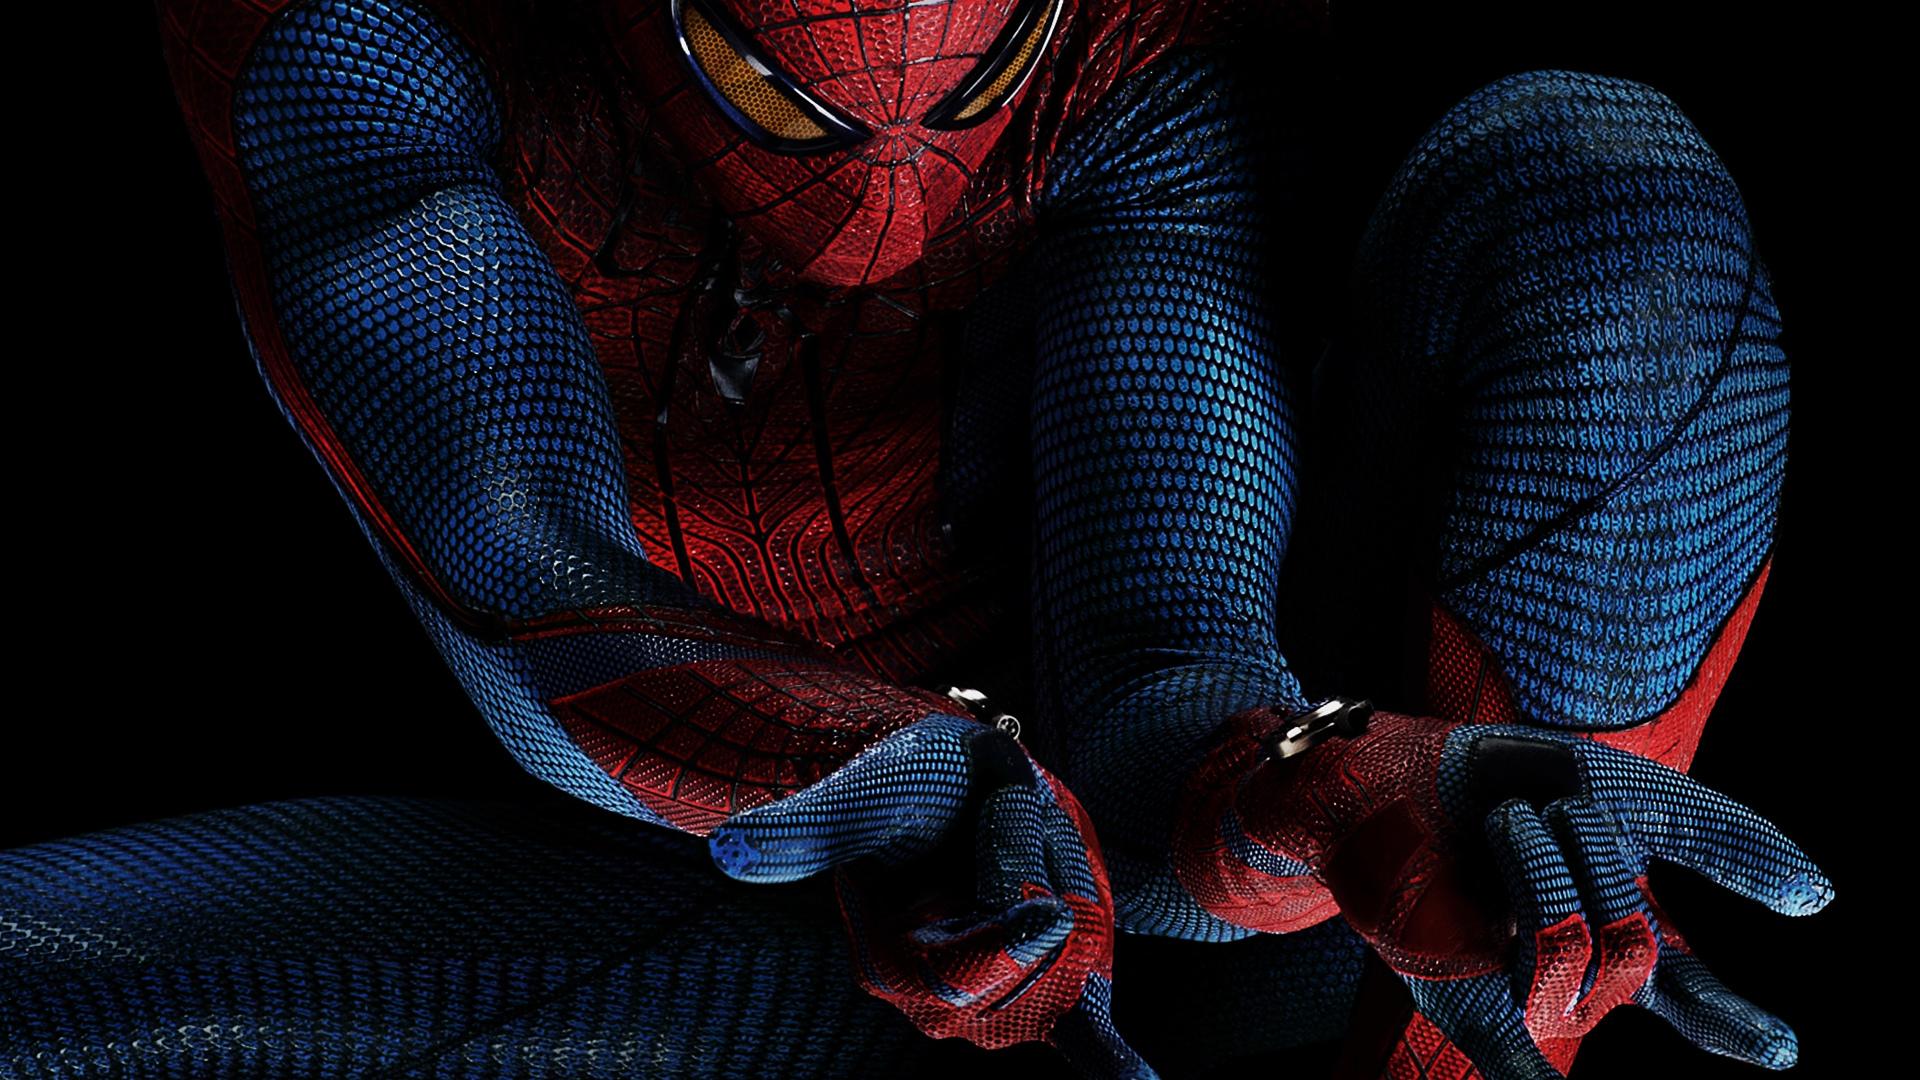 Spider Man Shattered Dimensions 4k Hd Desktop Wallpaper: Fondos De Pantalla De Spiderman, Wallpapers